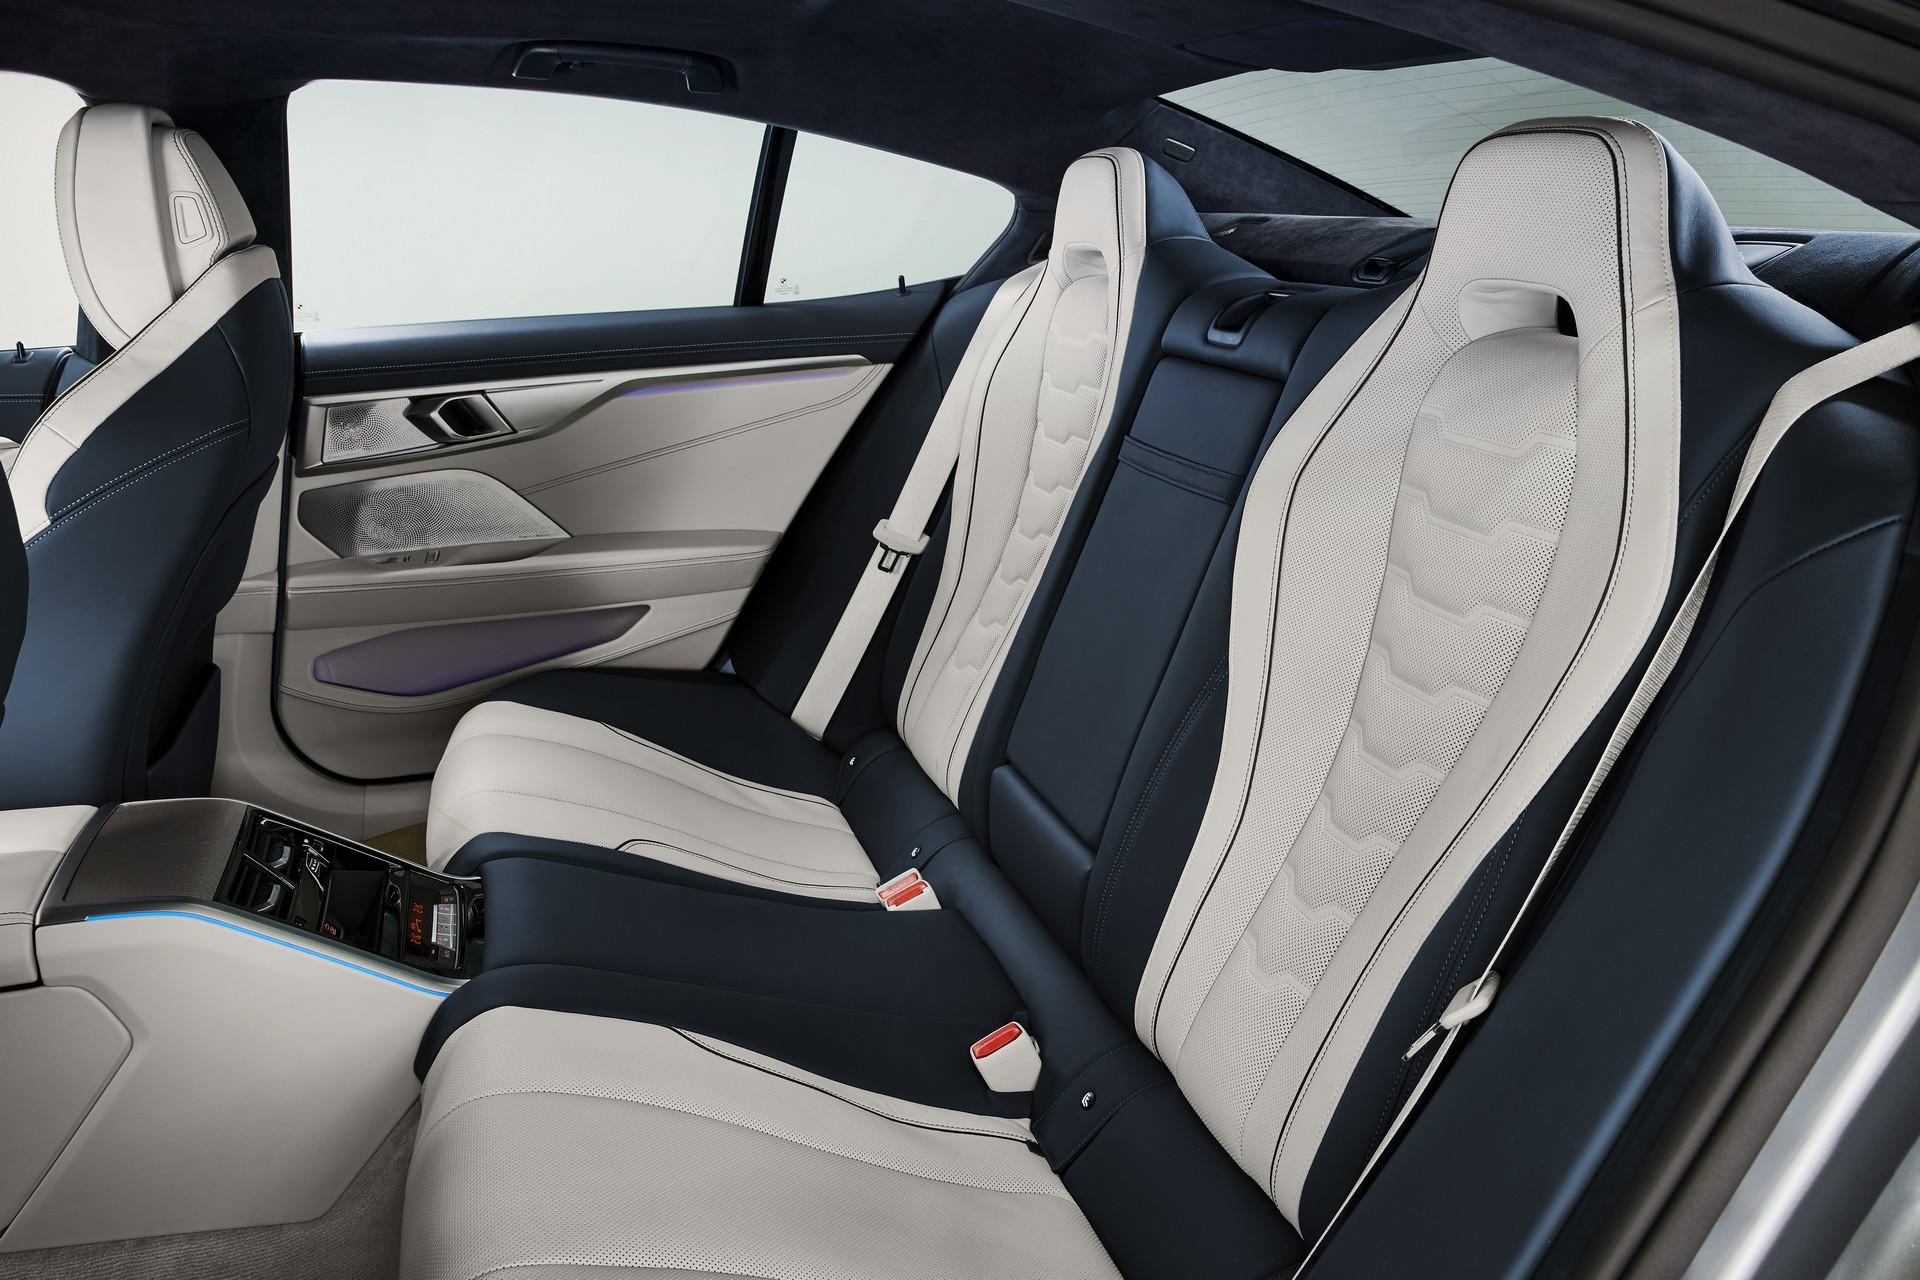 2020-bmw-8-series-gran-coupe-11.jpg